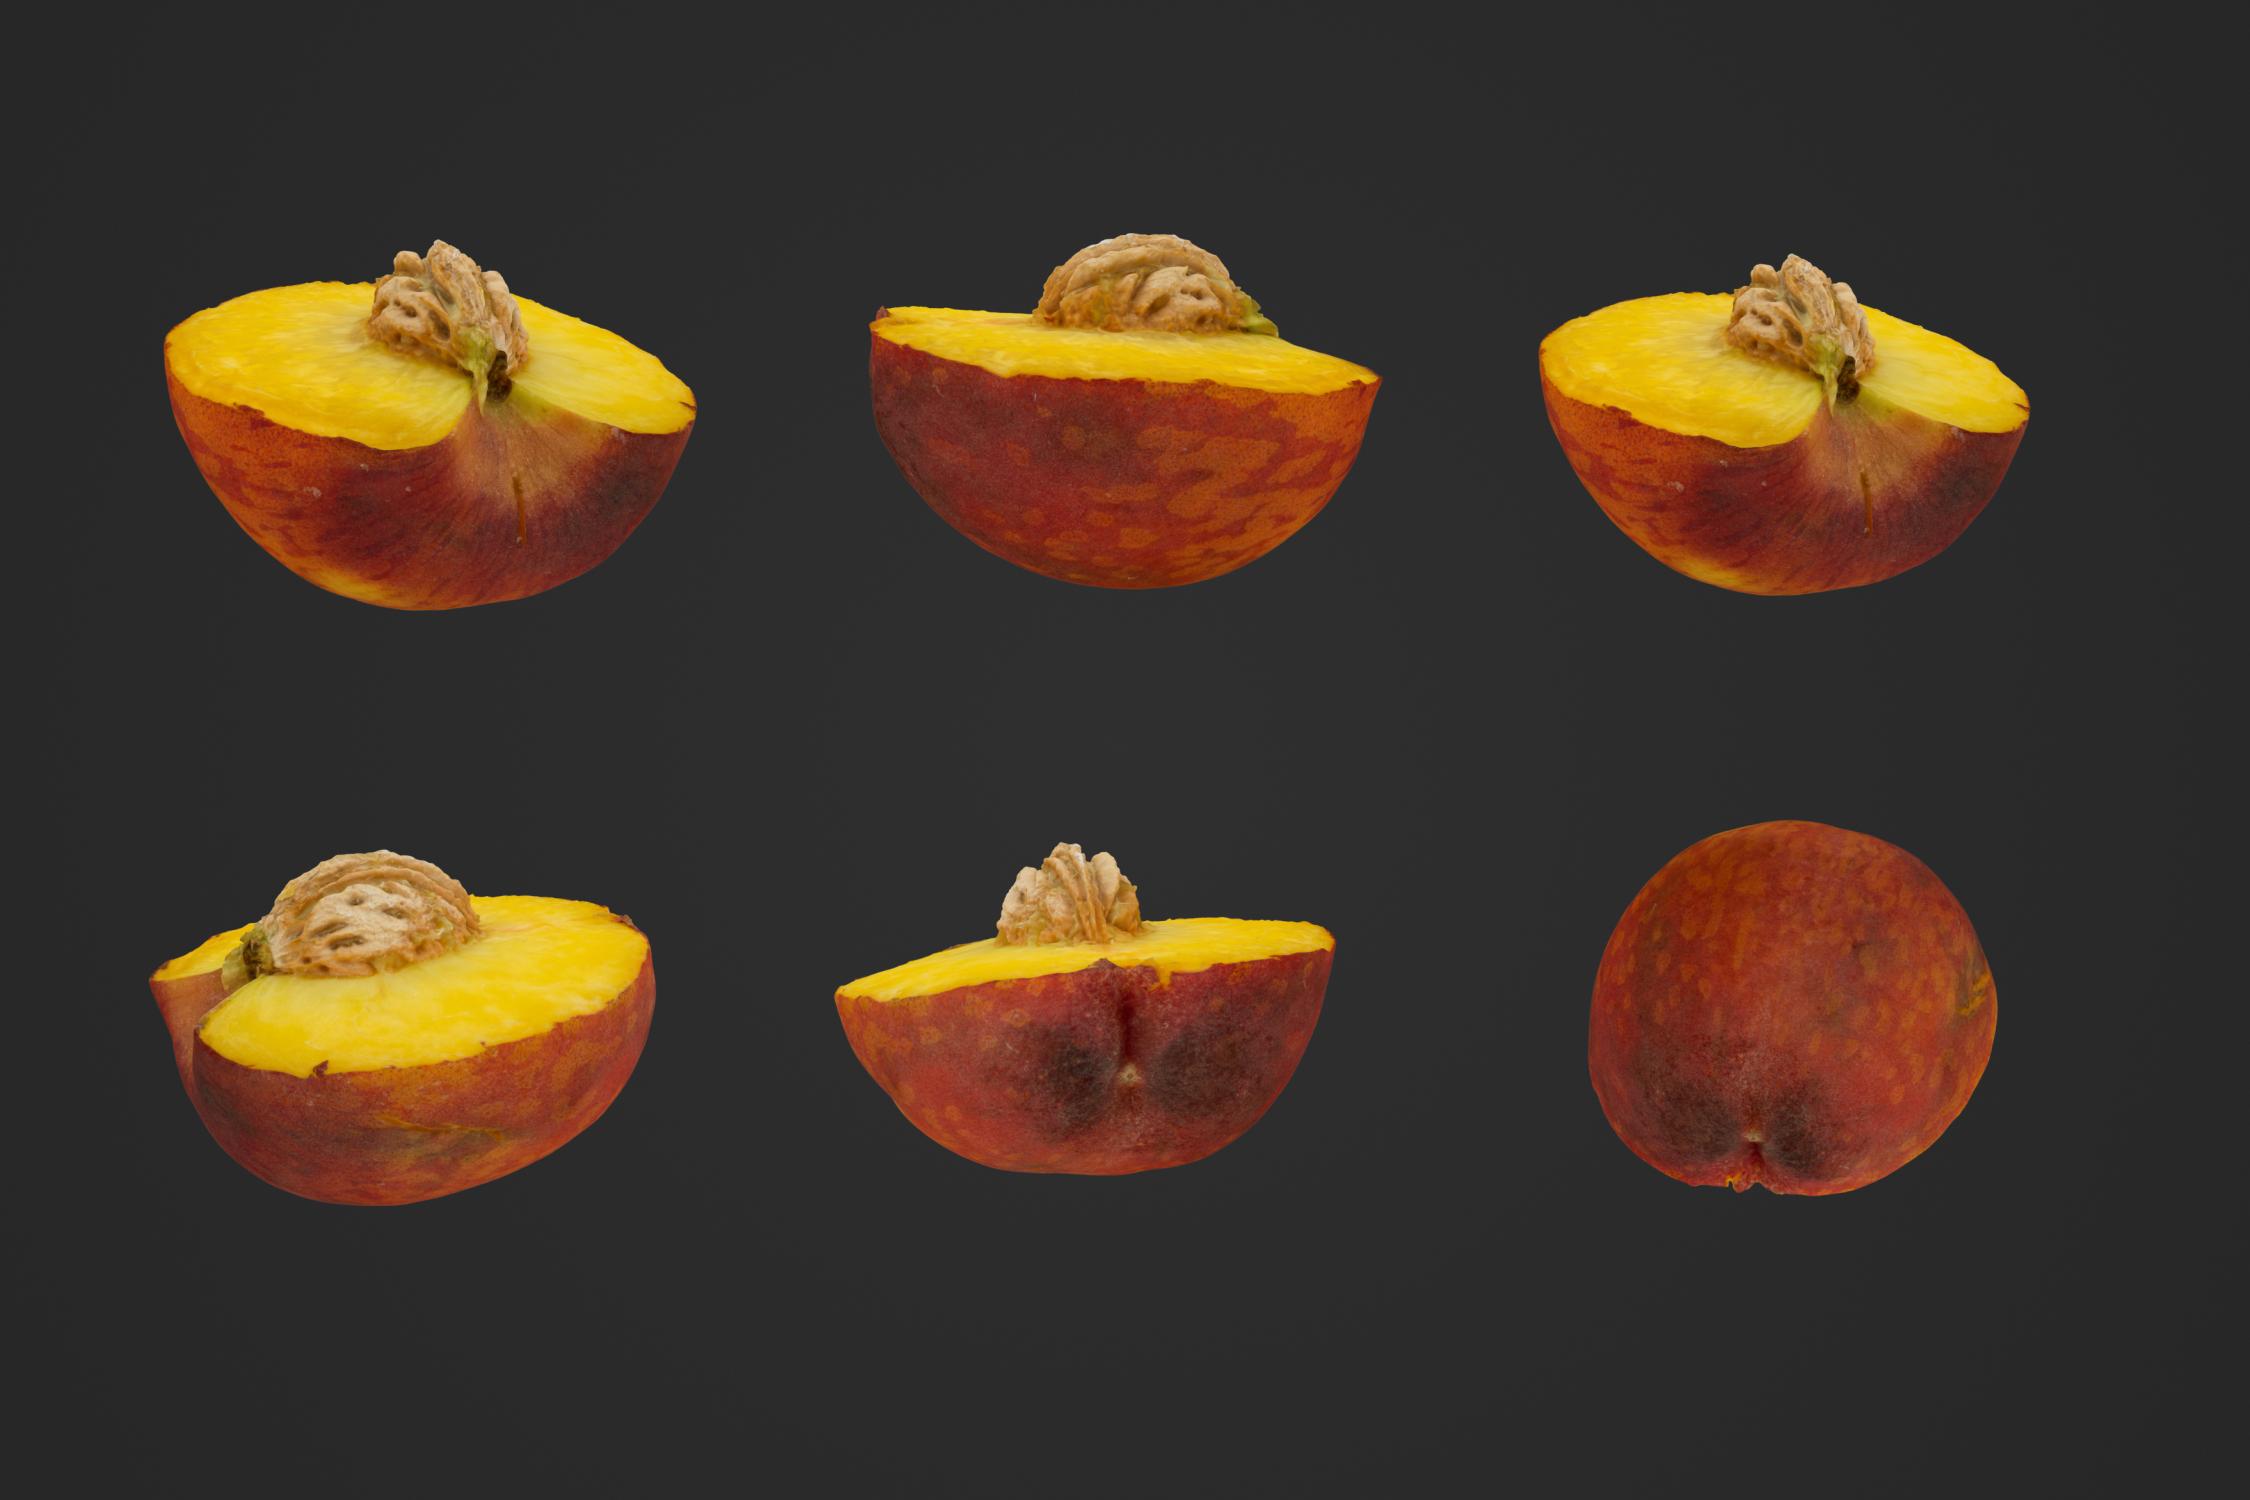 Half_Peach_2_1.jpg